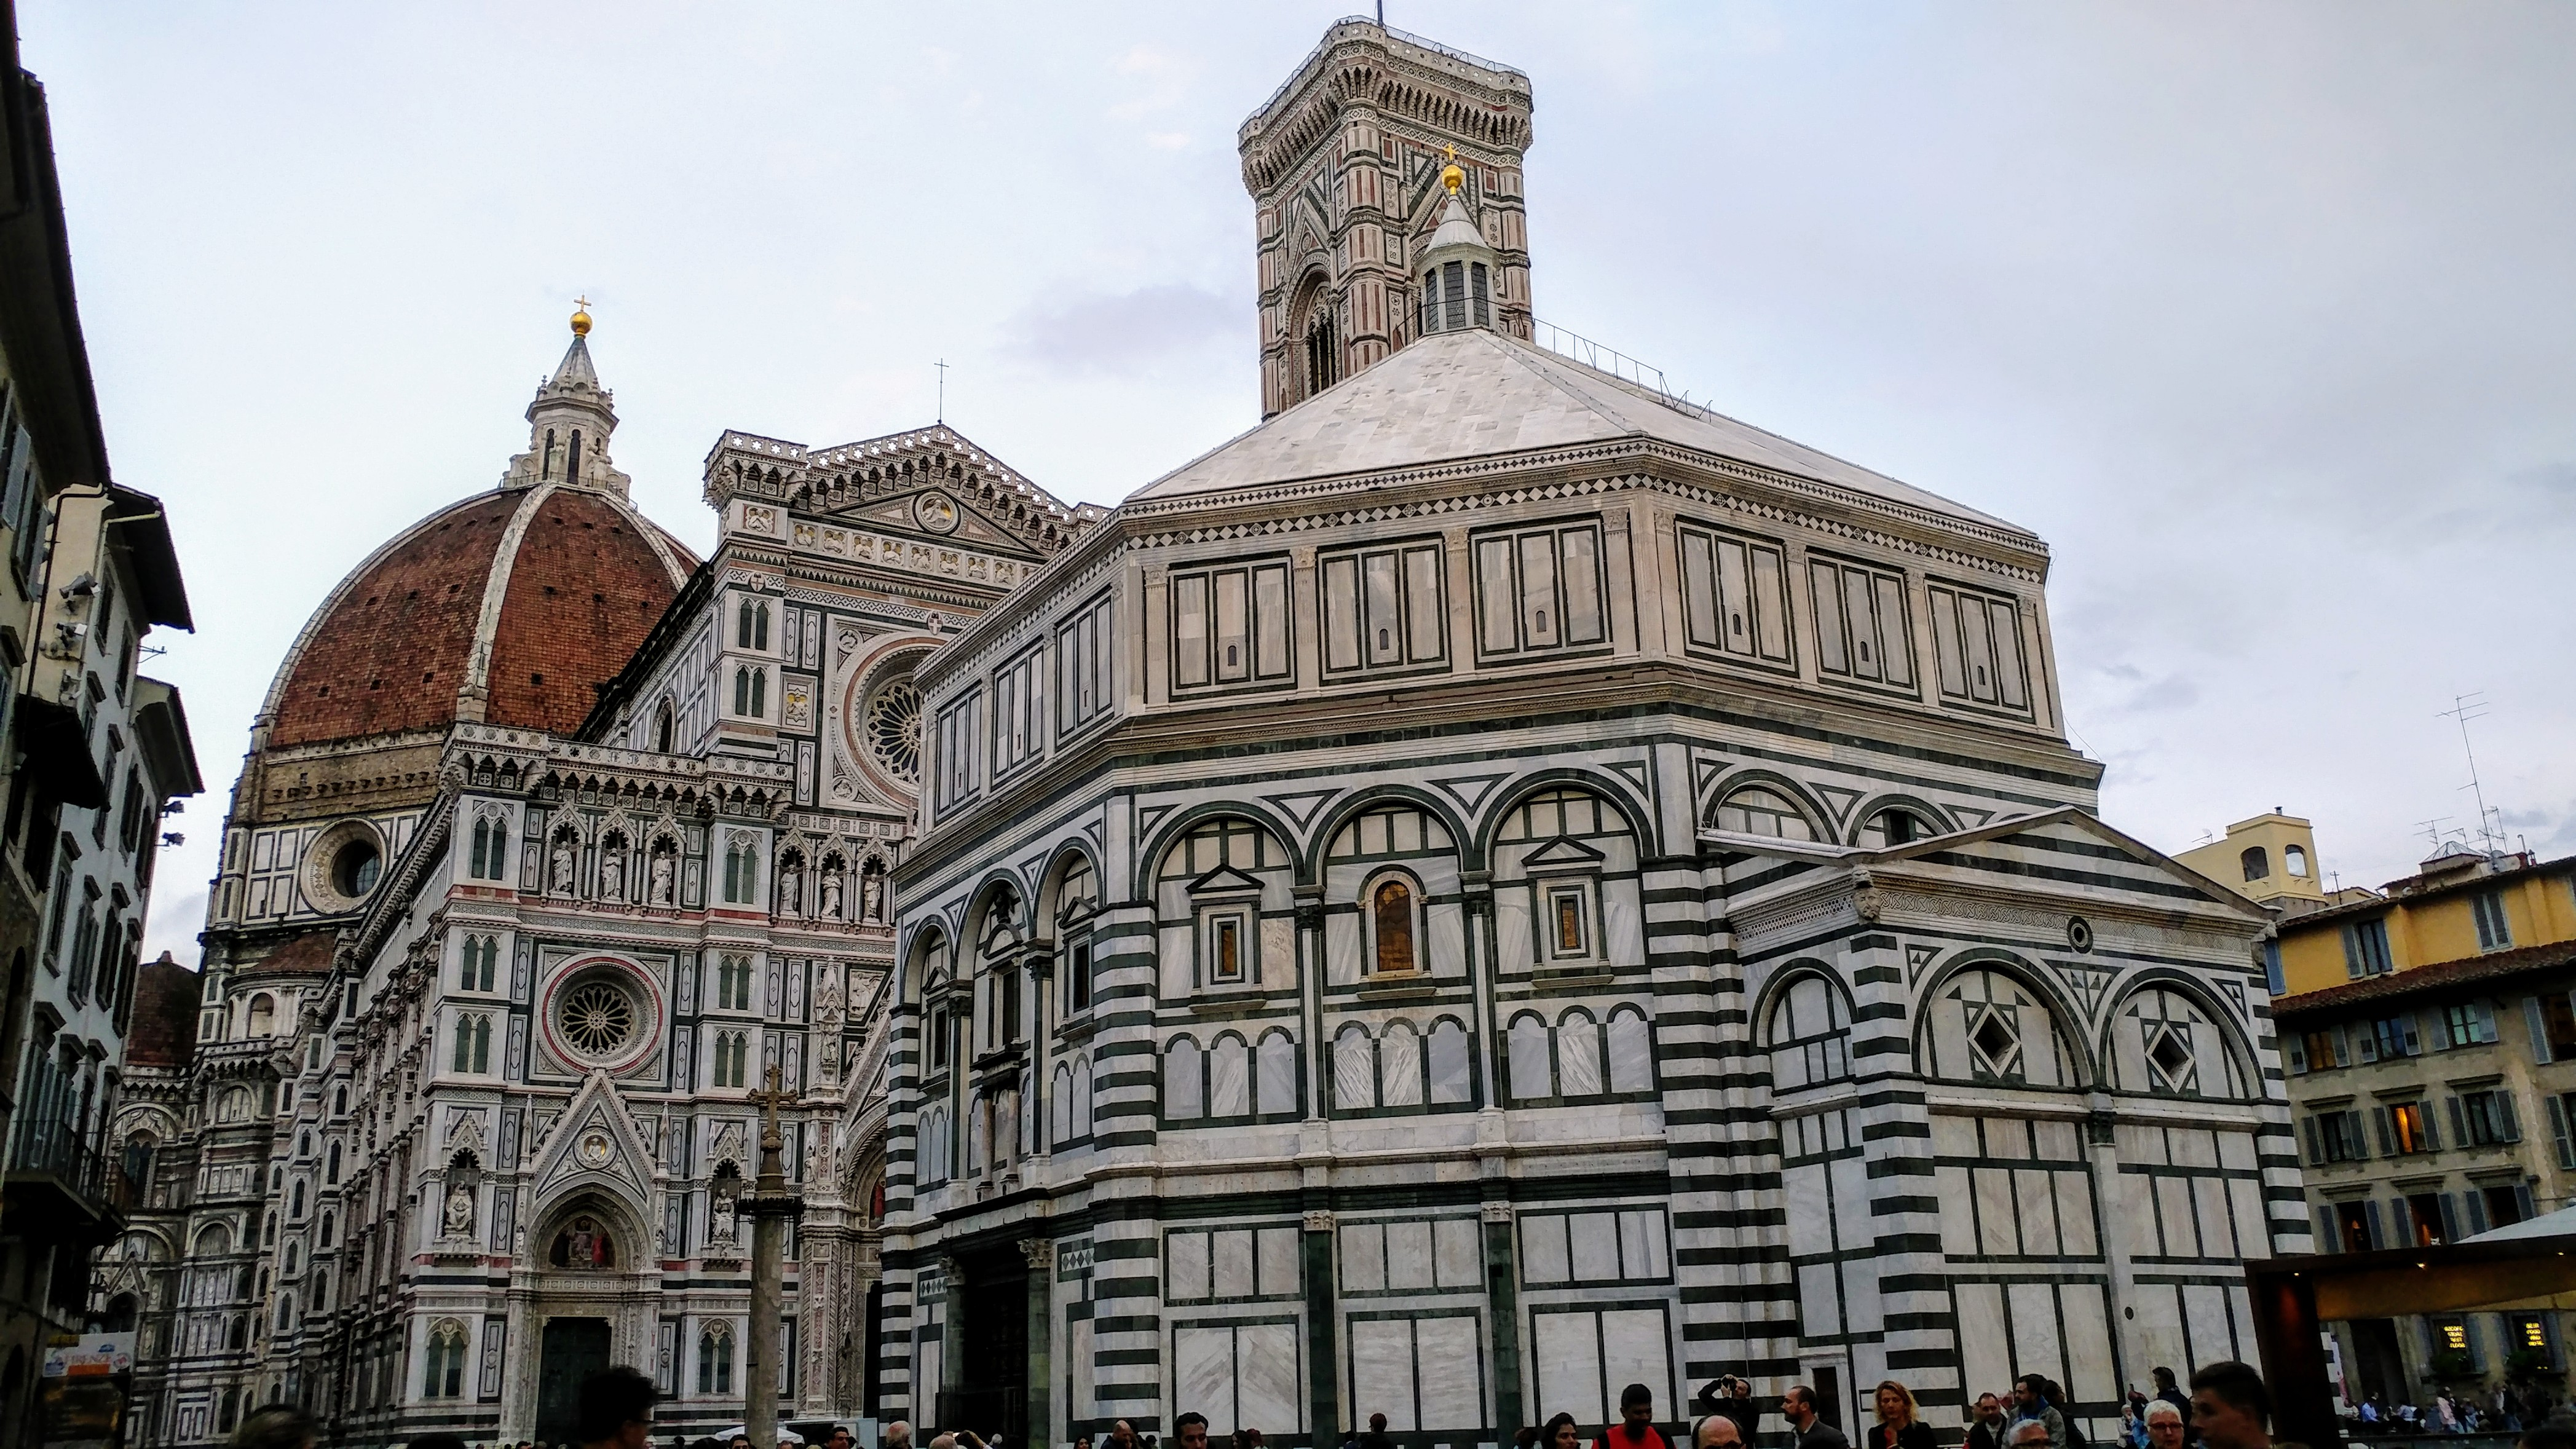 Italie Florence voyage paysage destination Europe